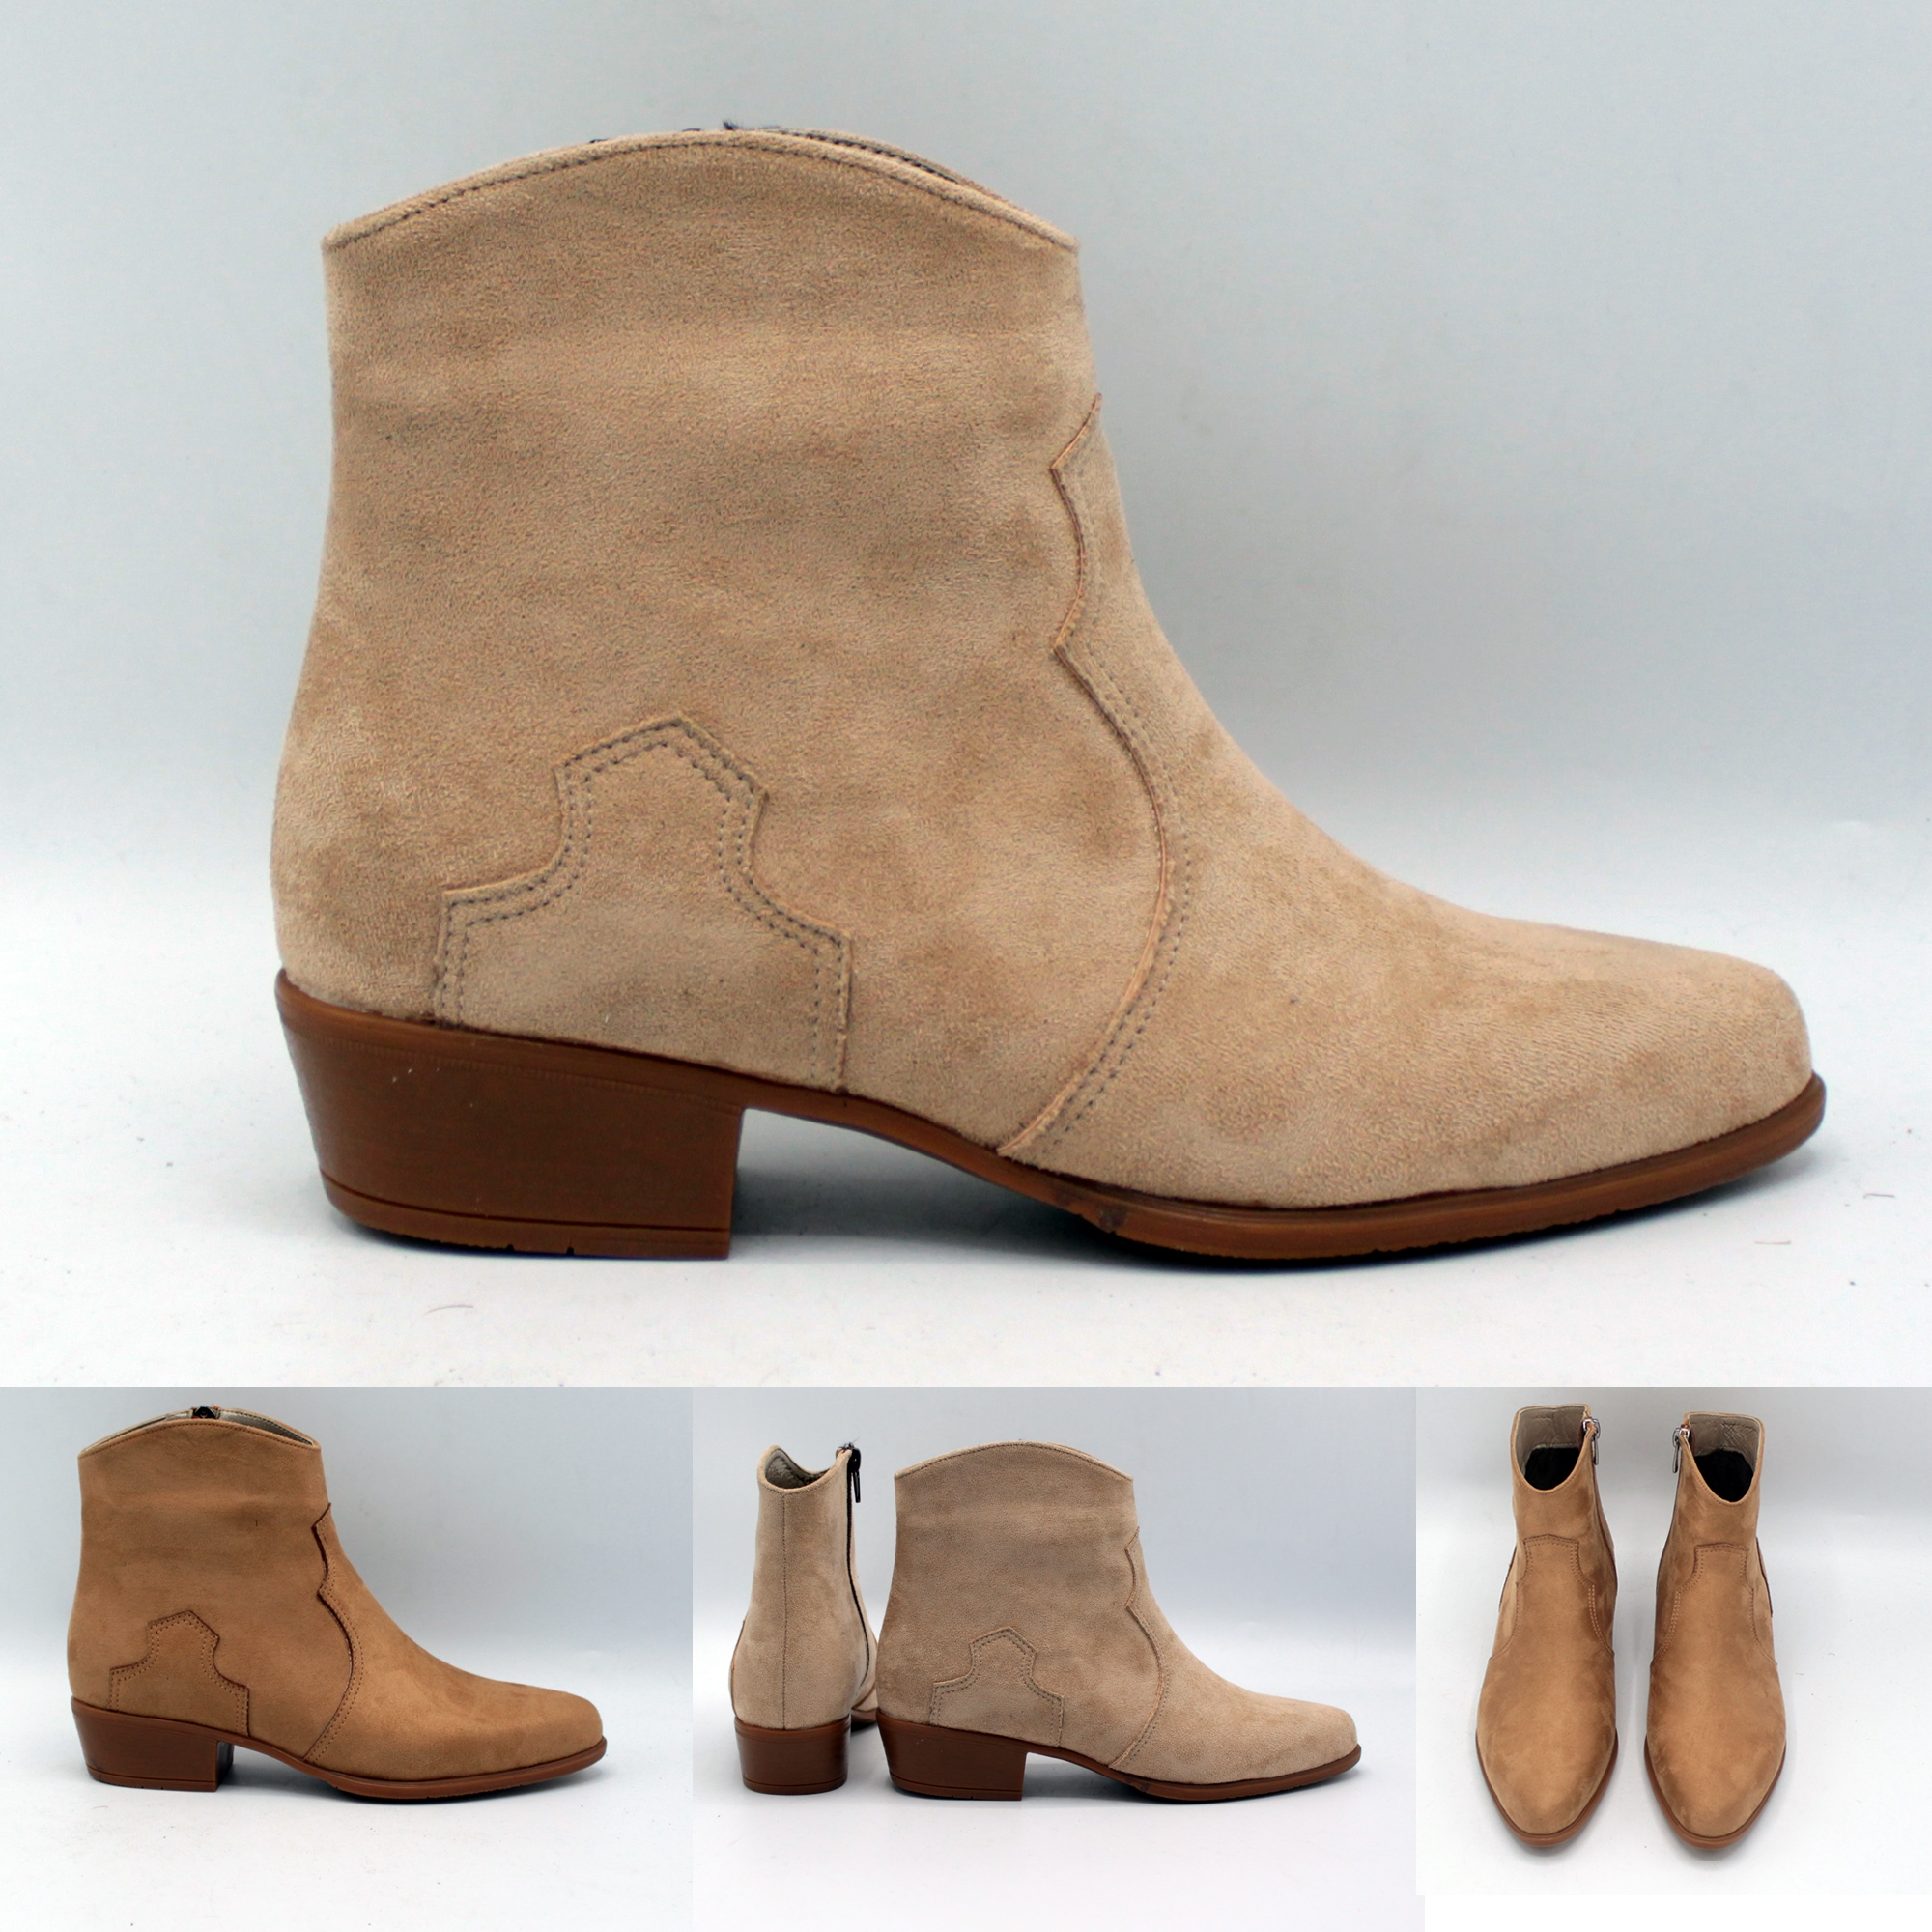 Stylish Cowboy Low Heel Women Suede Western Boots